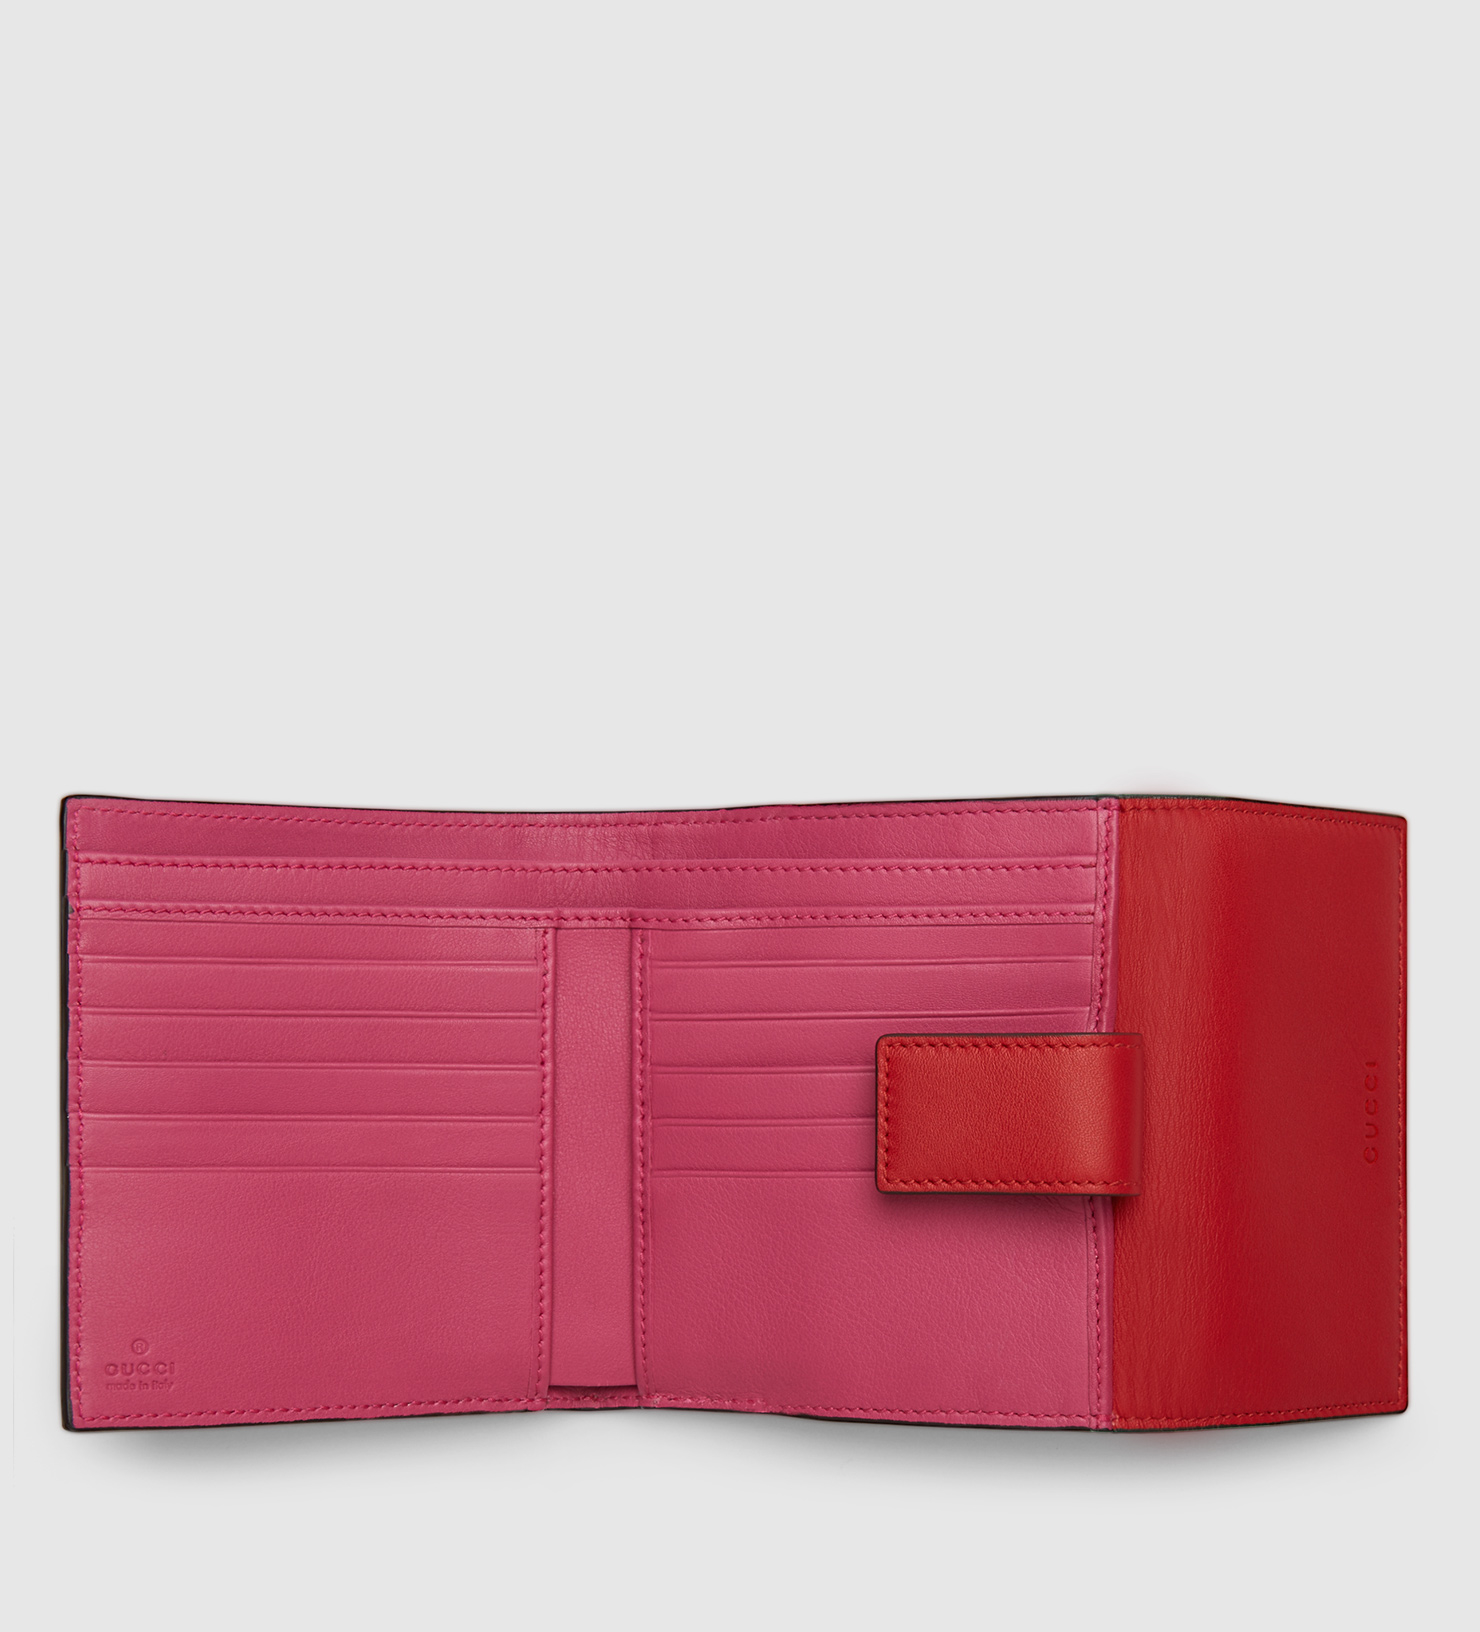 3d13069795e2 Lyst - Gucci Gg Supreme French Flap Wallet